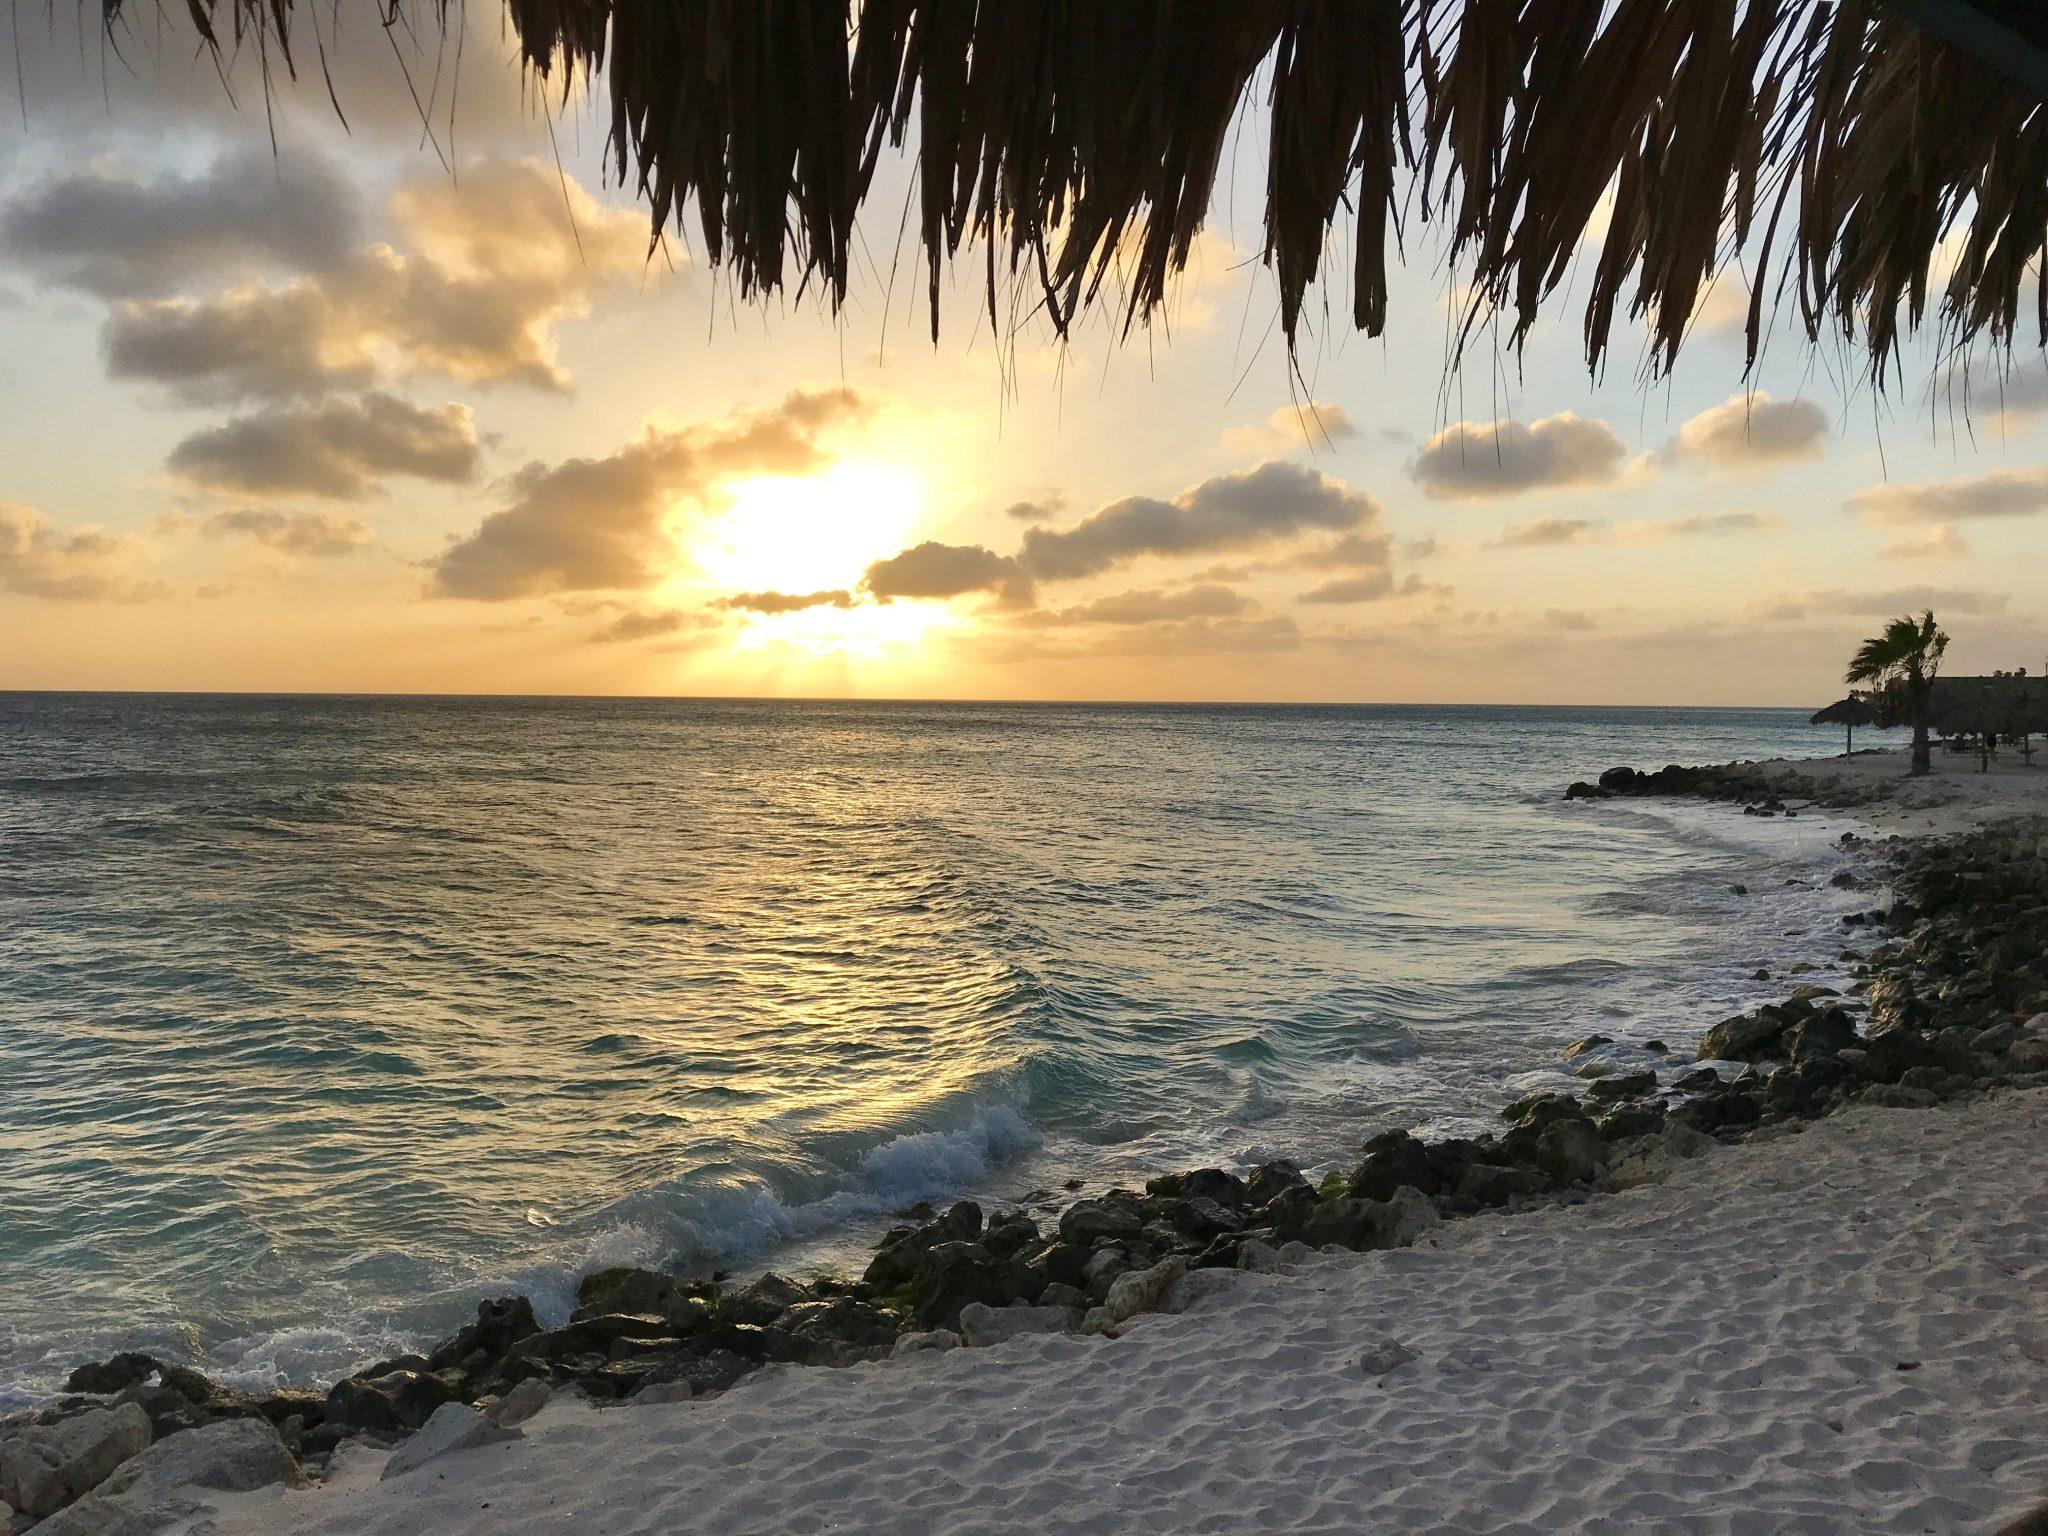 sunset over Divi Beach, Aruba